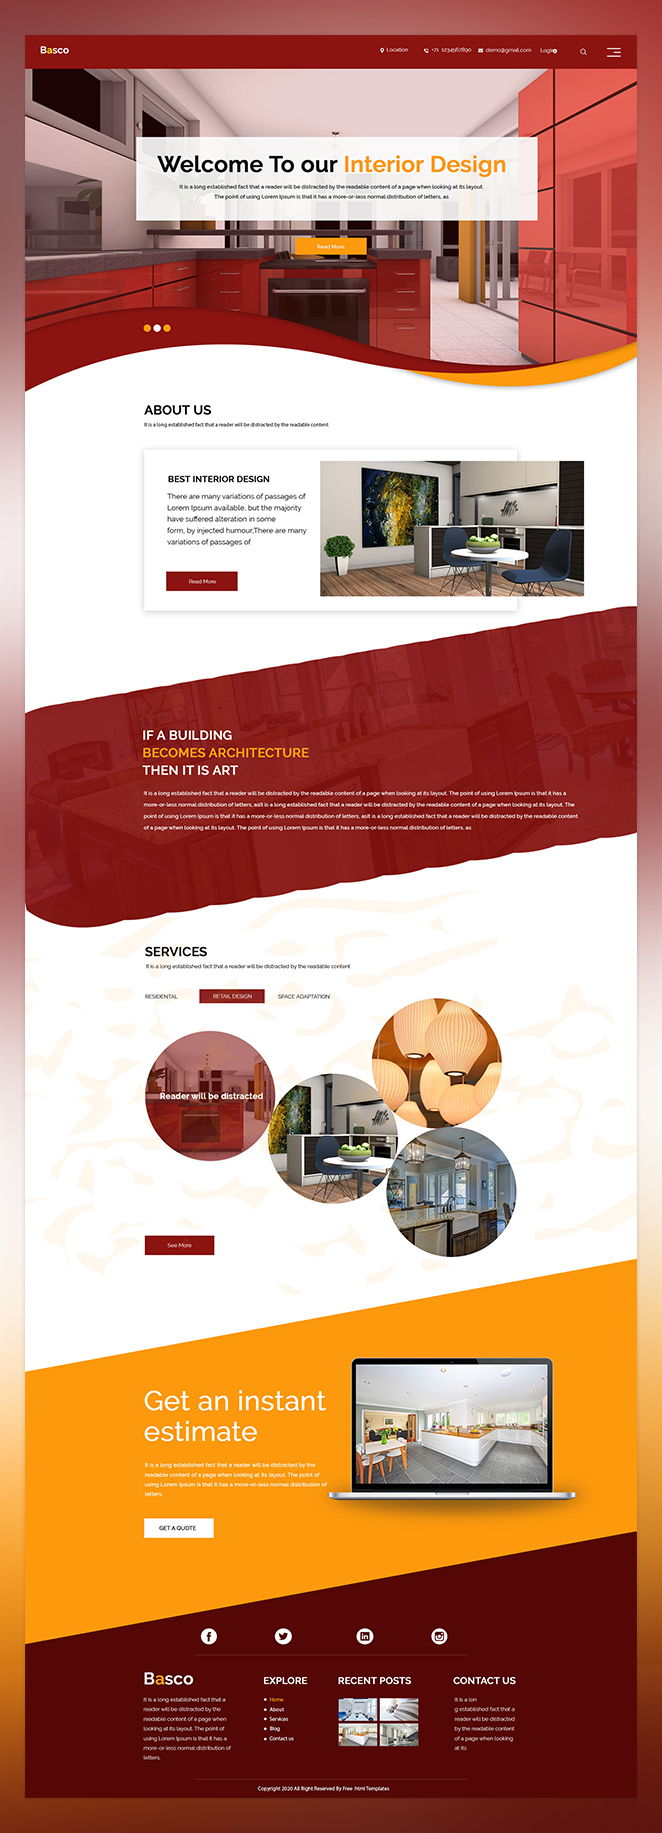 Basco interior design psd template